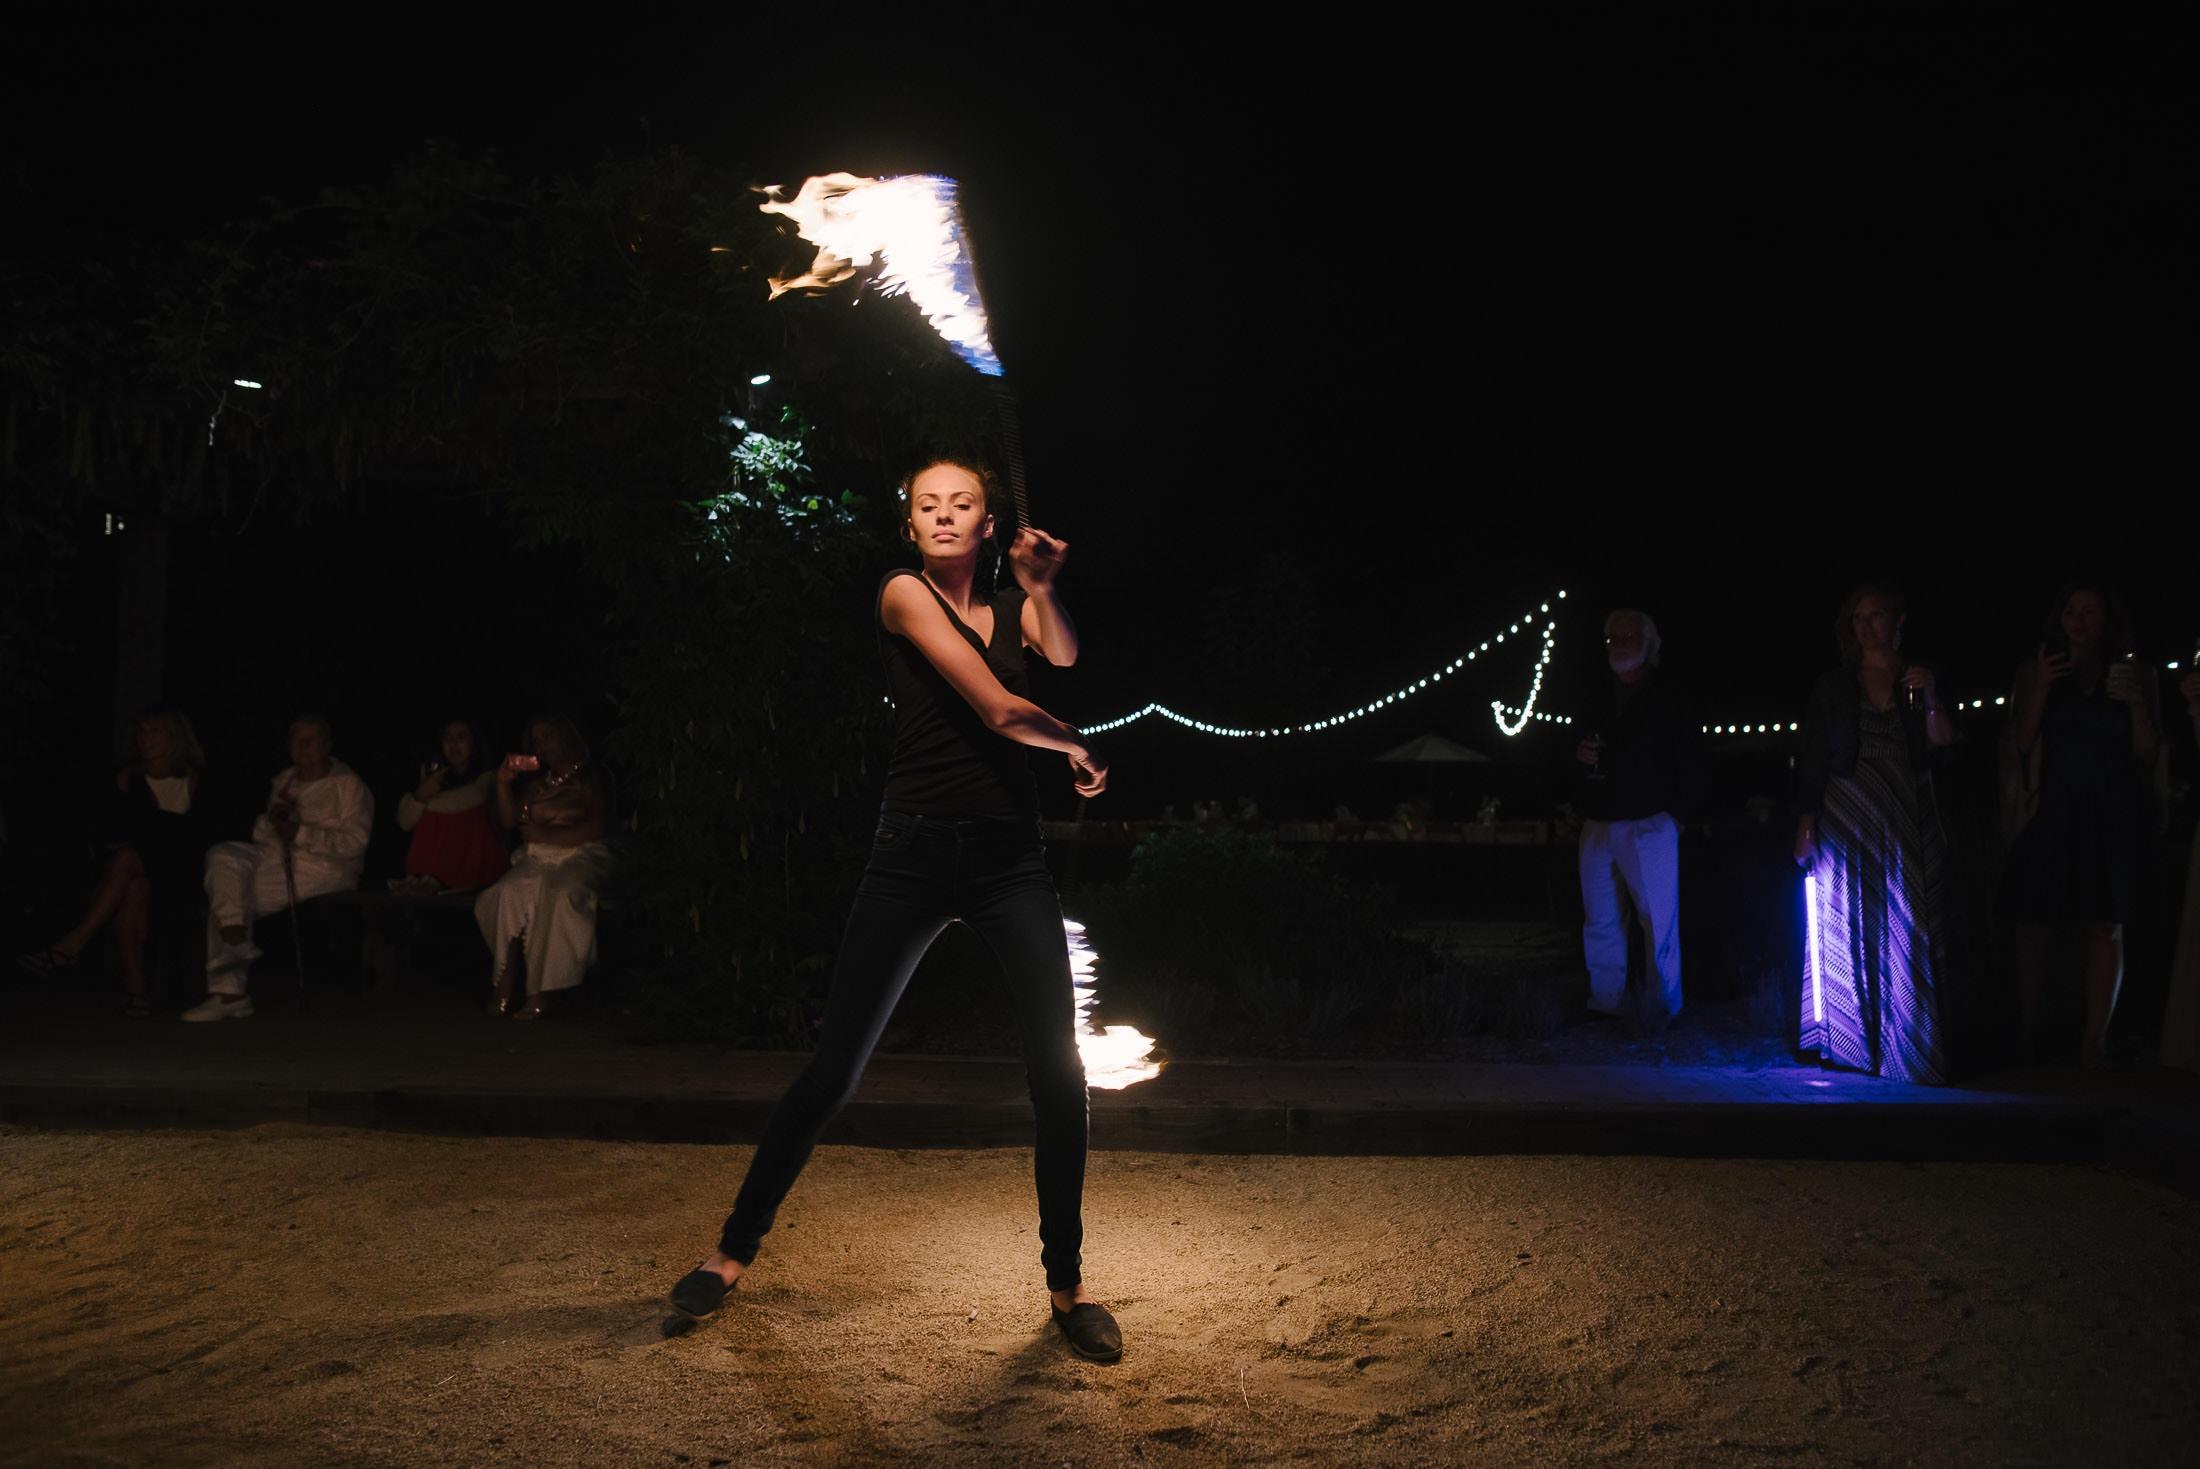 Fire Dancer at Sebastopol wedding